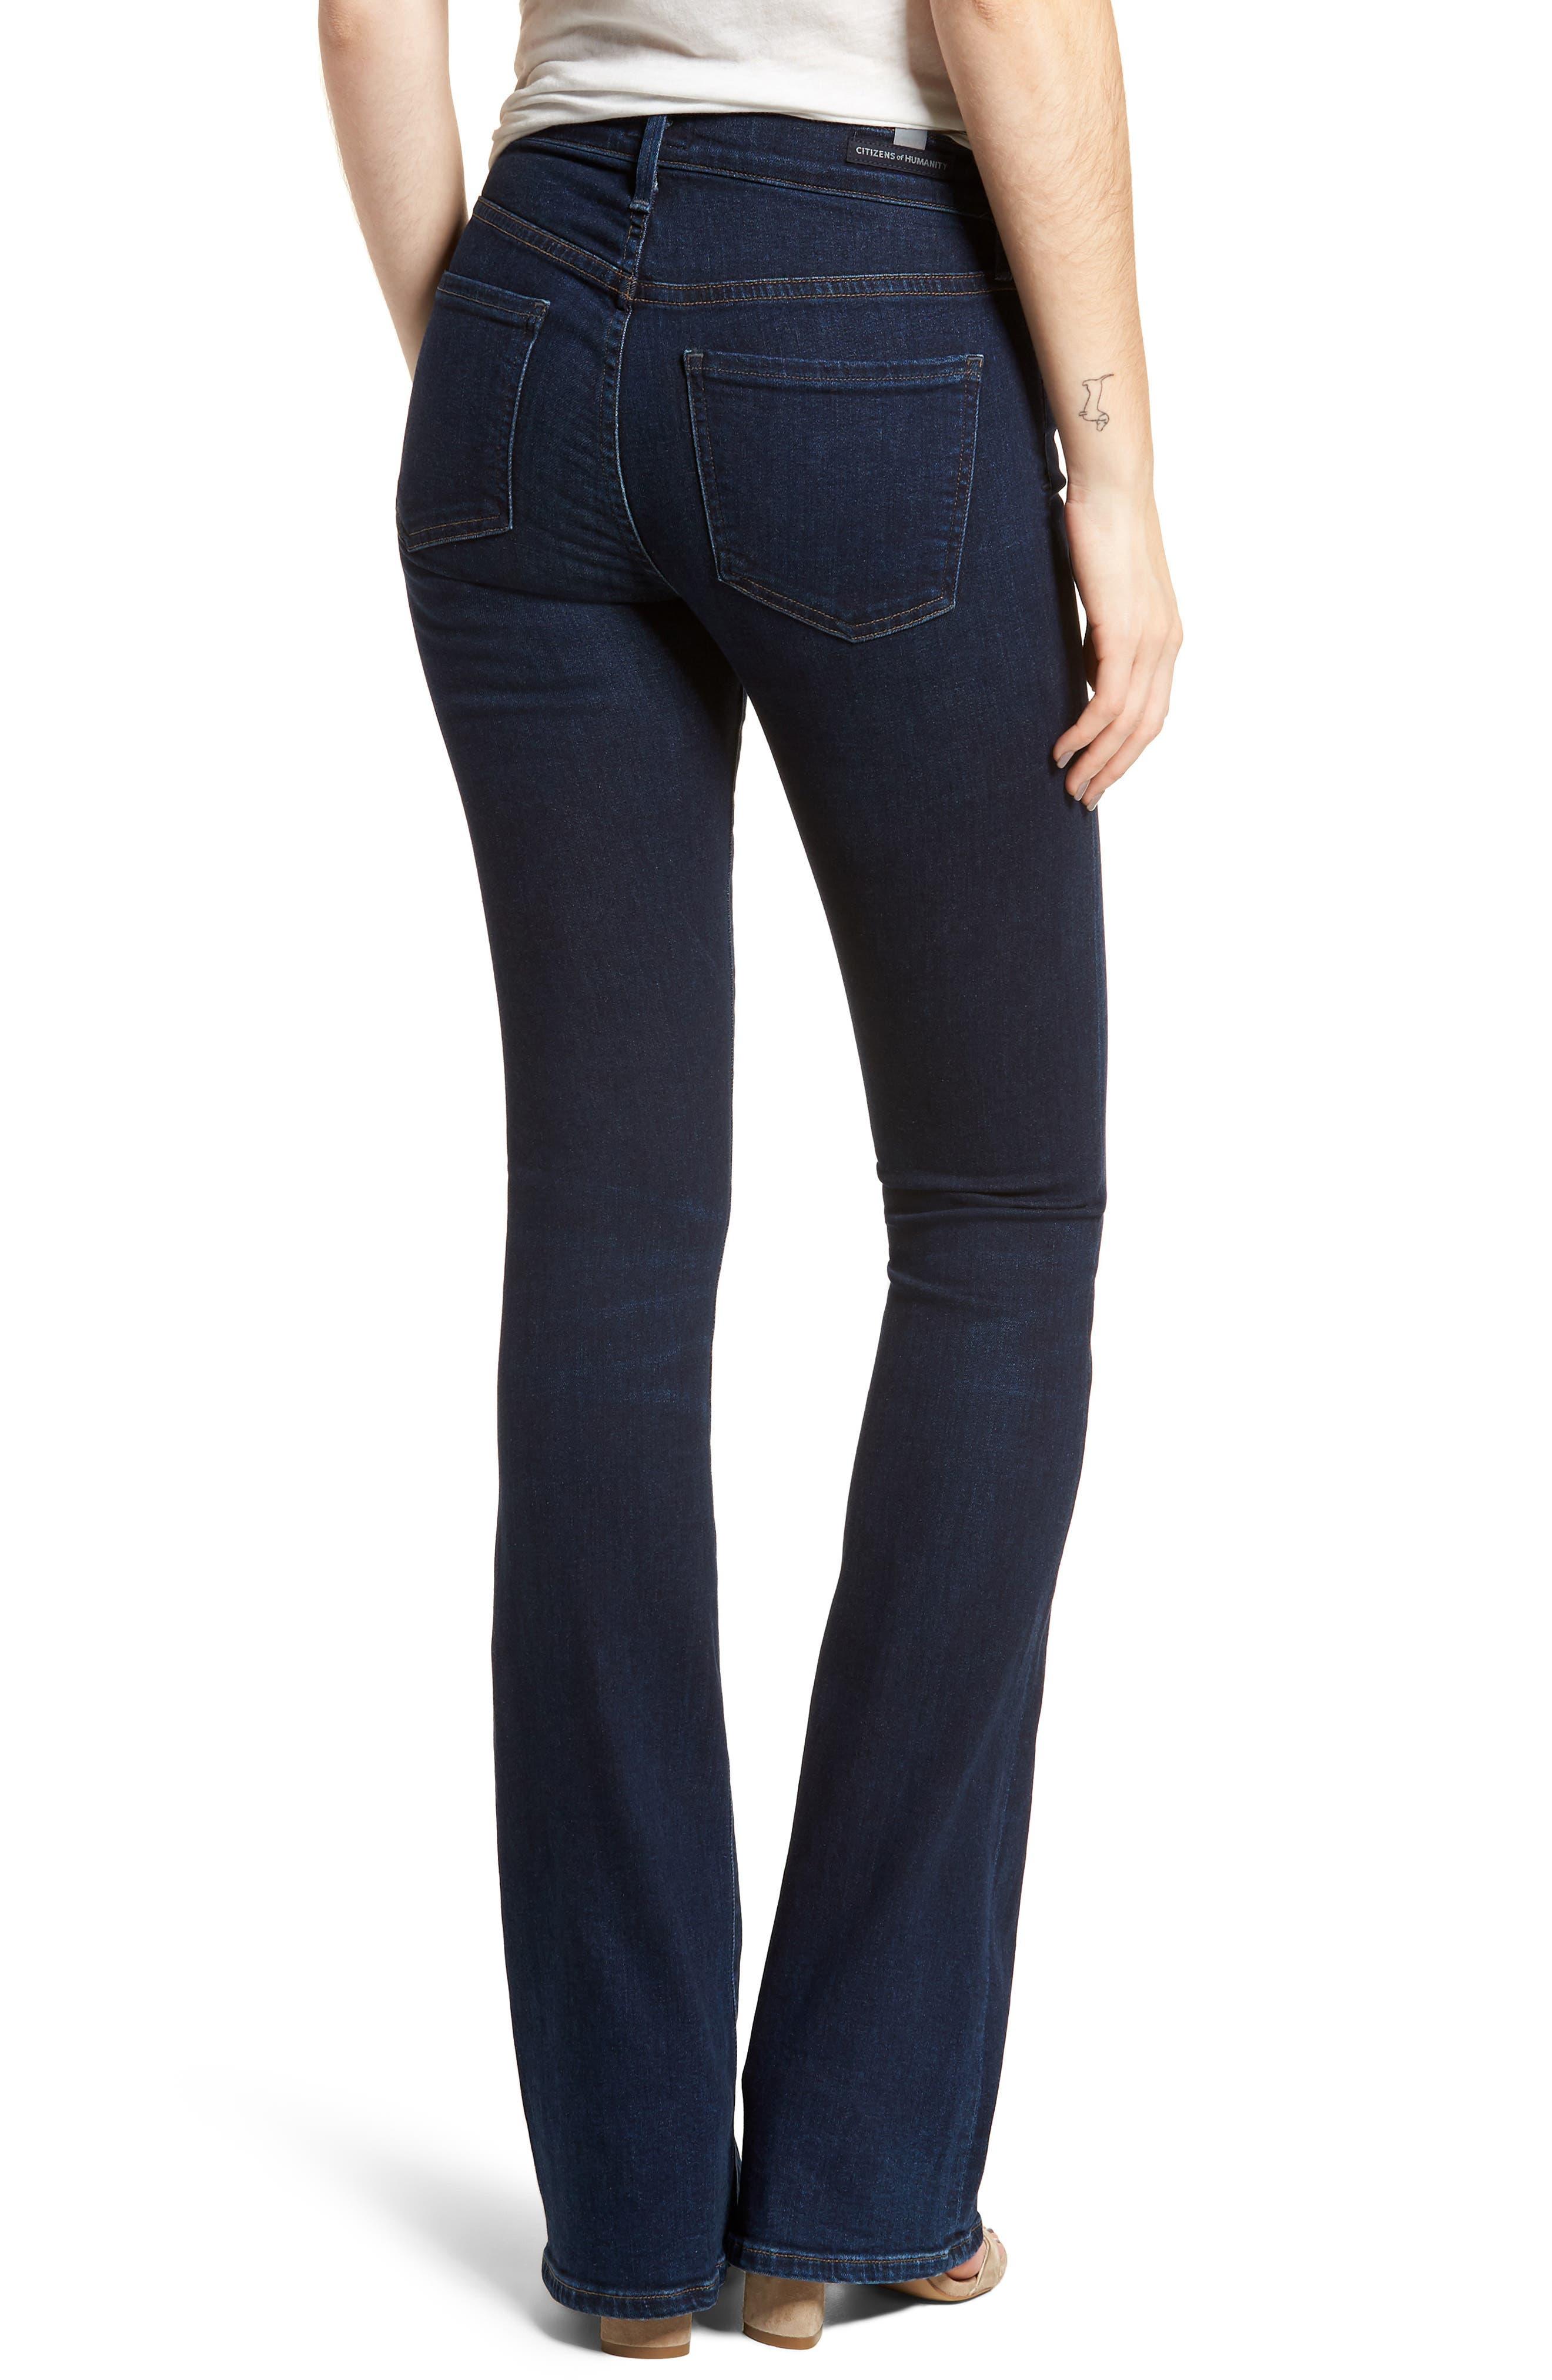 d82d4d7d4a0 Women's Citizens Of Humanity Bootcut Jeans | Nordstrom